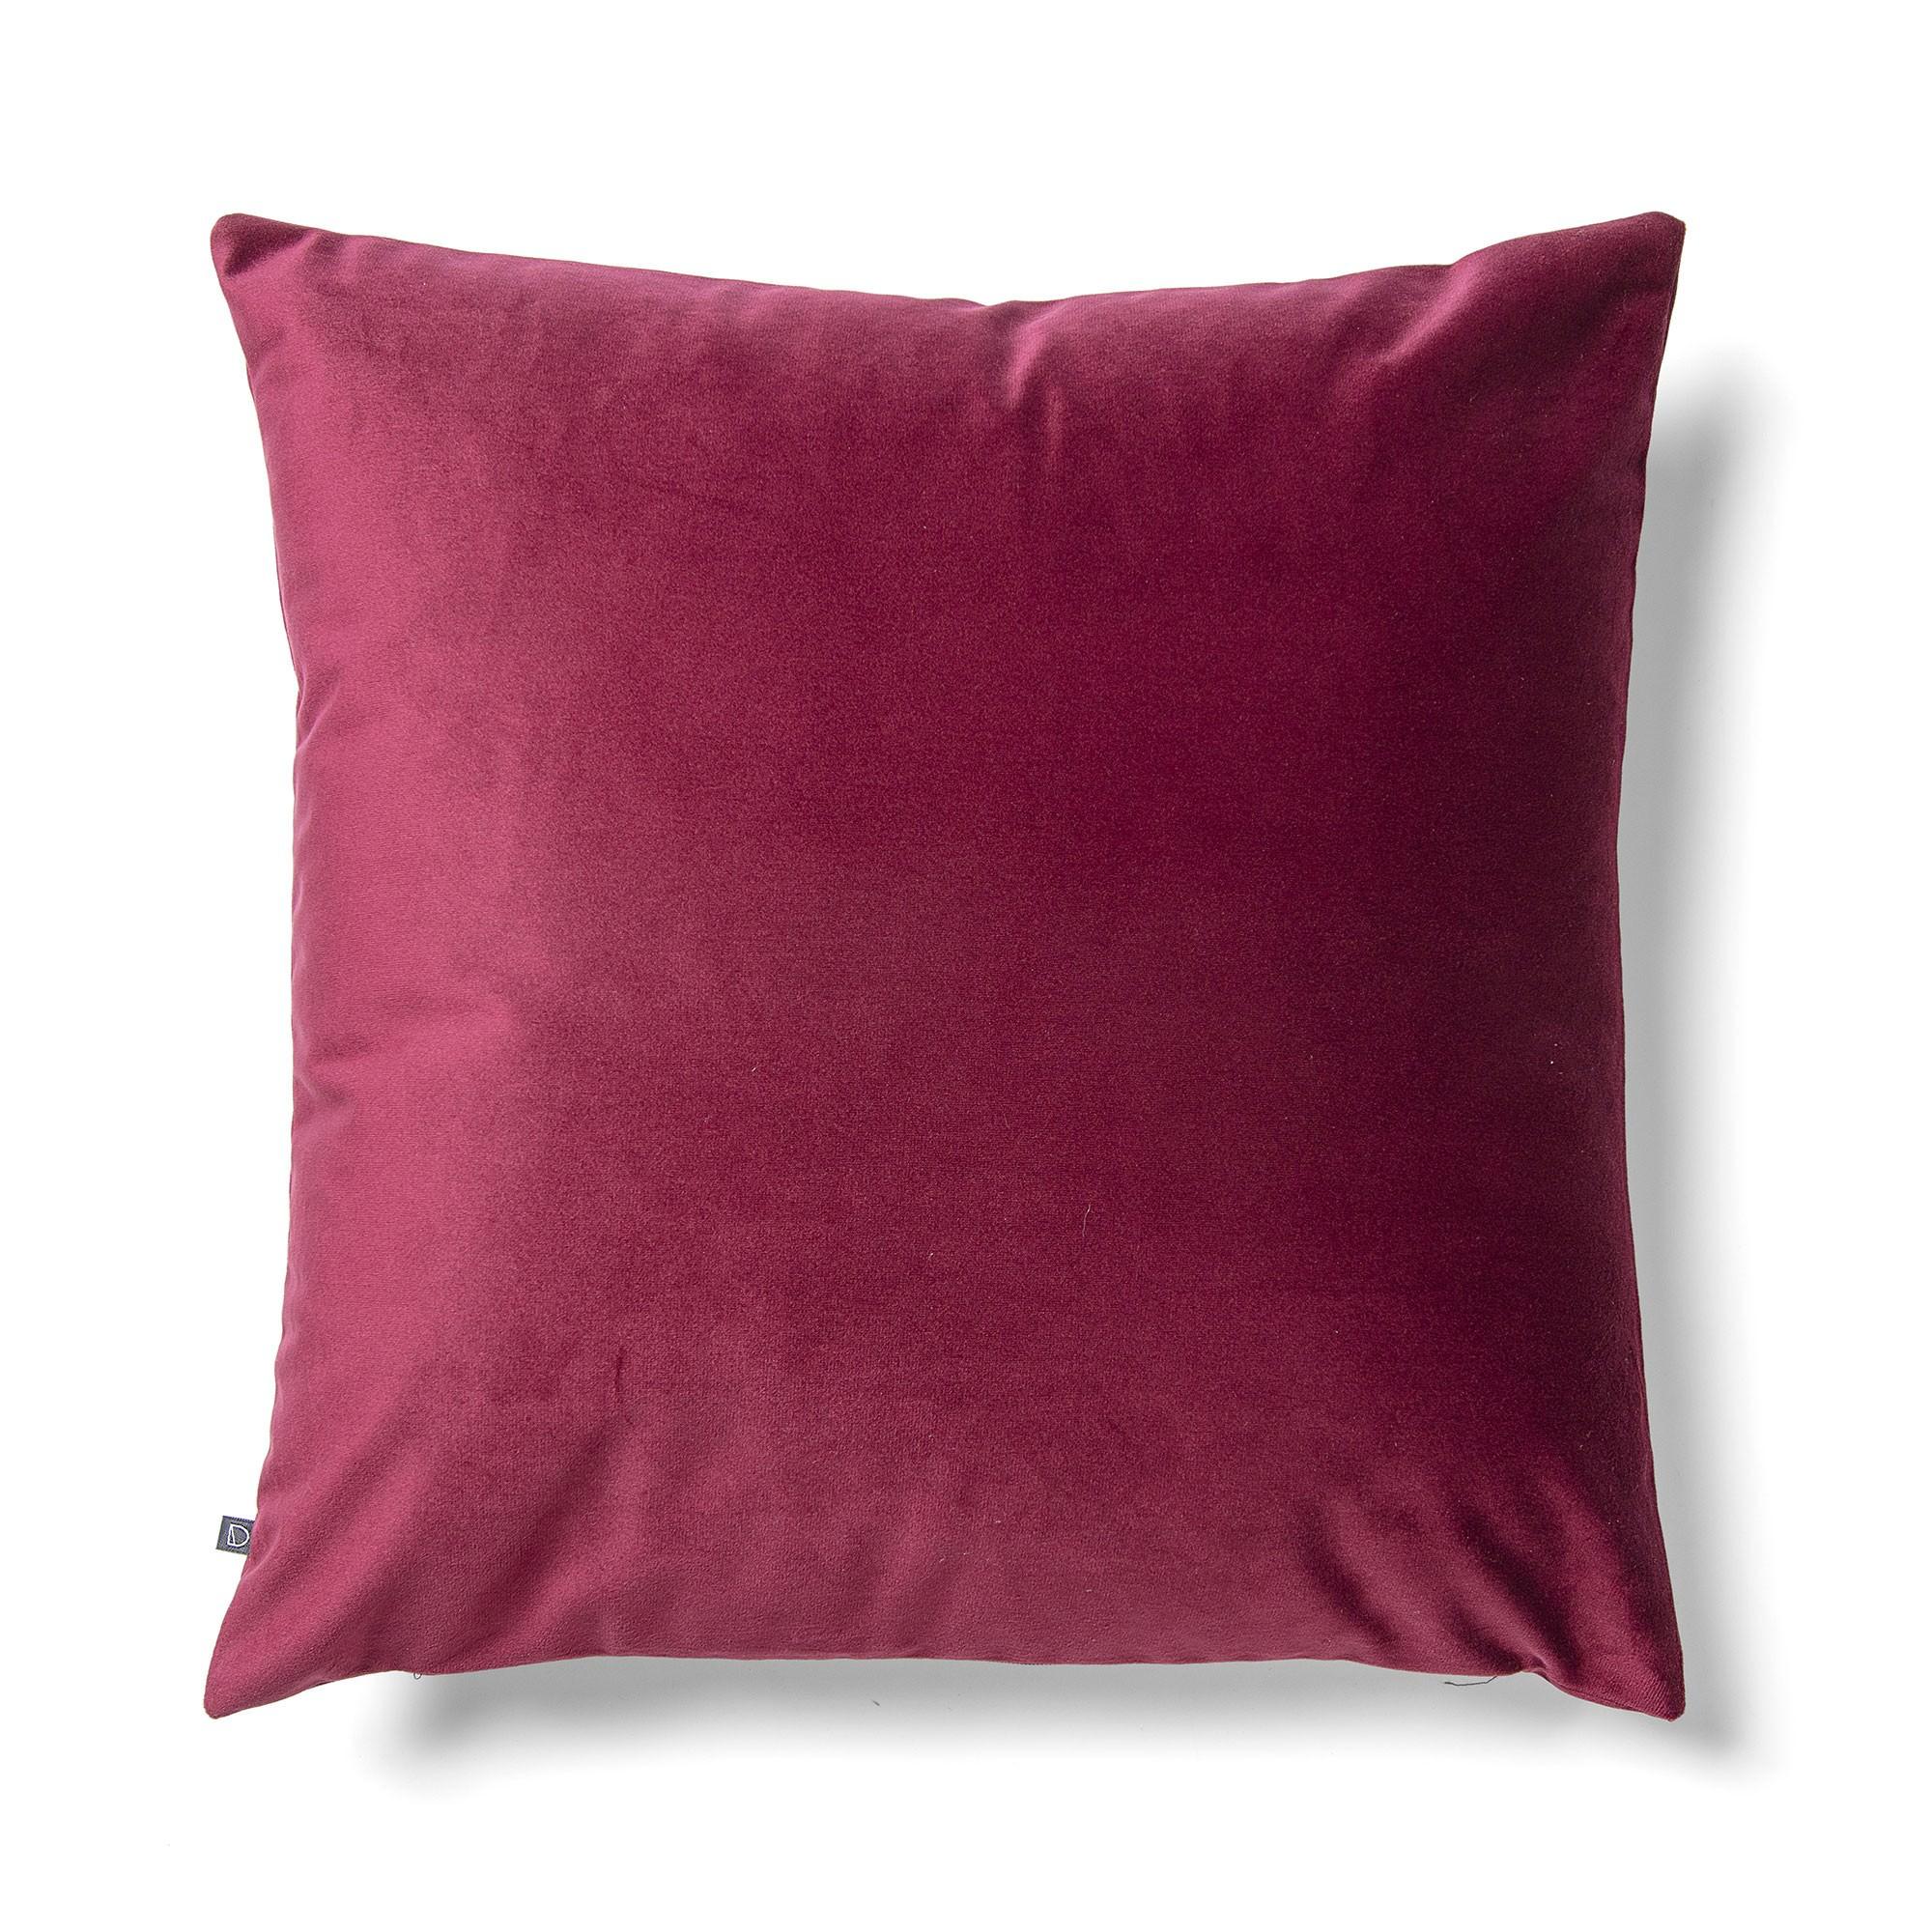 Daraya Velvet Fabric Scatter Cushion, Burgundy